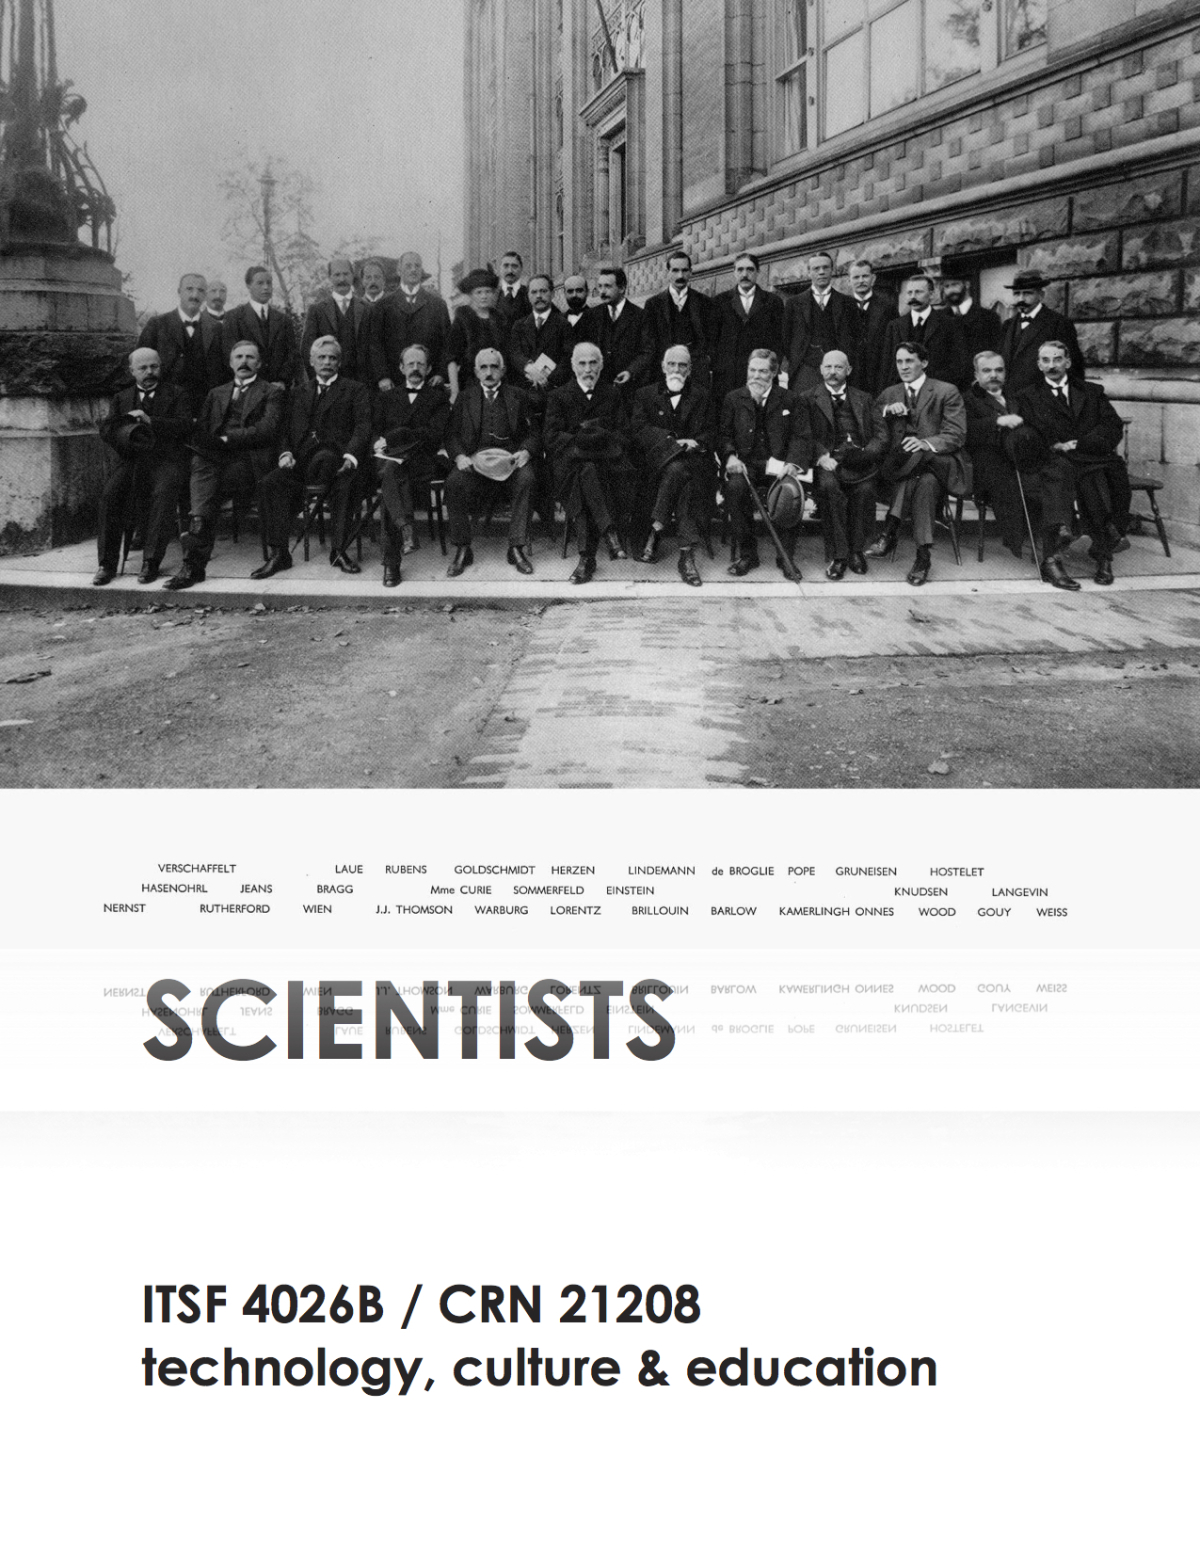 itsf 4026b flyers - scientists.jpg